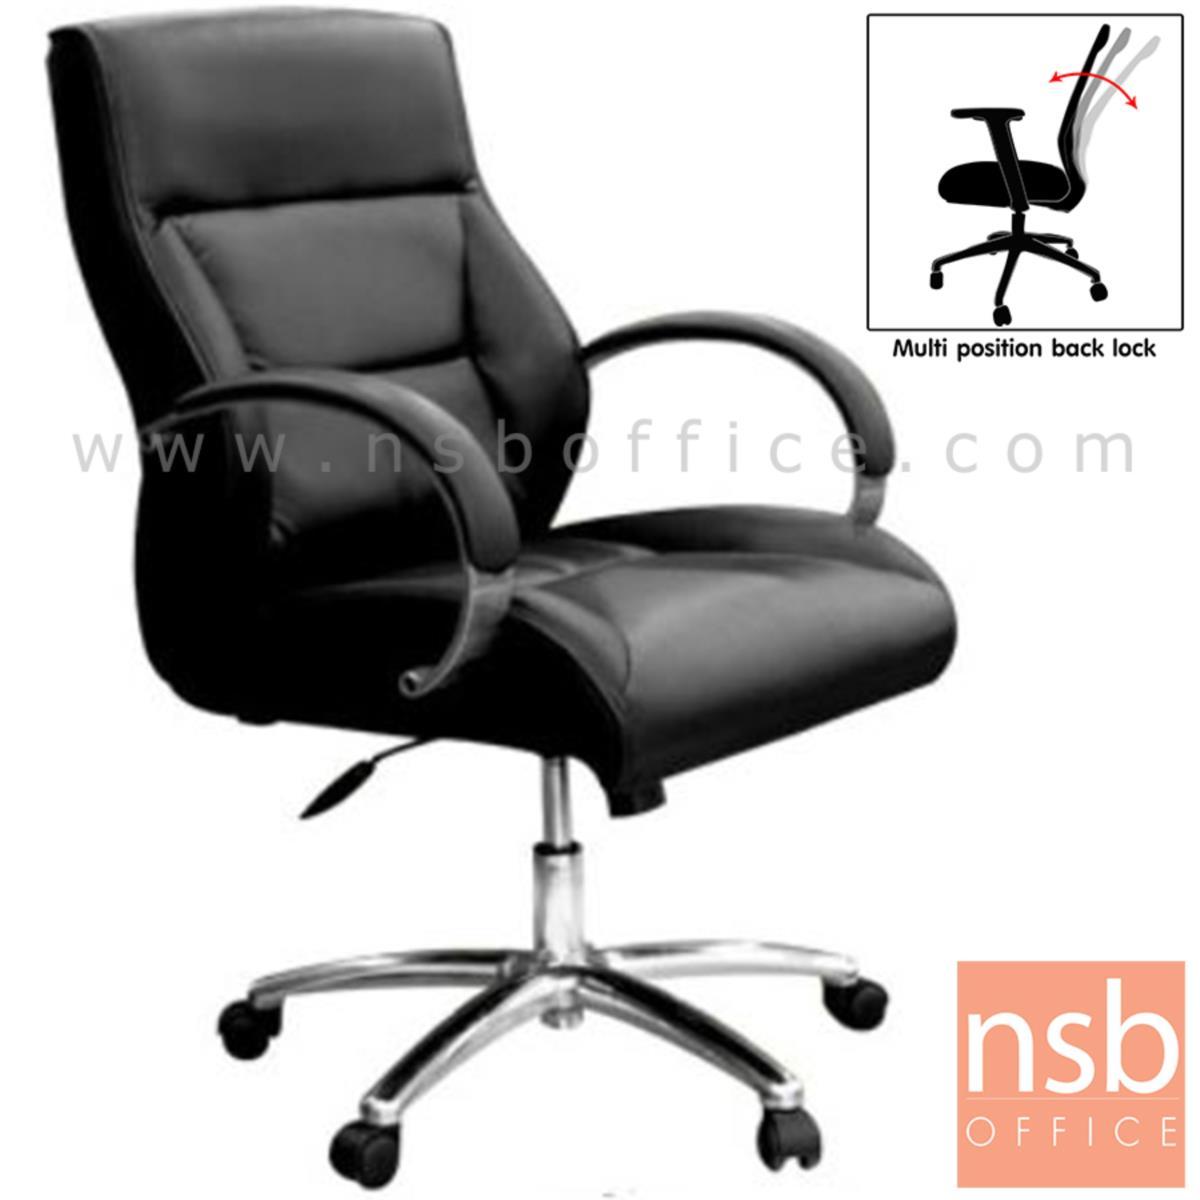 B26A029:เก้าอี้หัวหน้างาน รุ่น Blockhead  โช๊คแก๊ส มีก้อนโยก ขาเหล็กชุบโครเมี่ยม